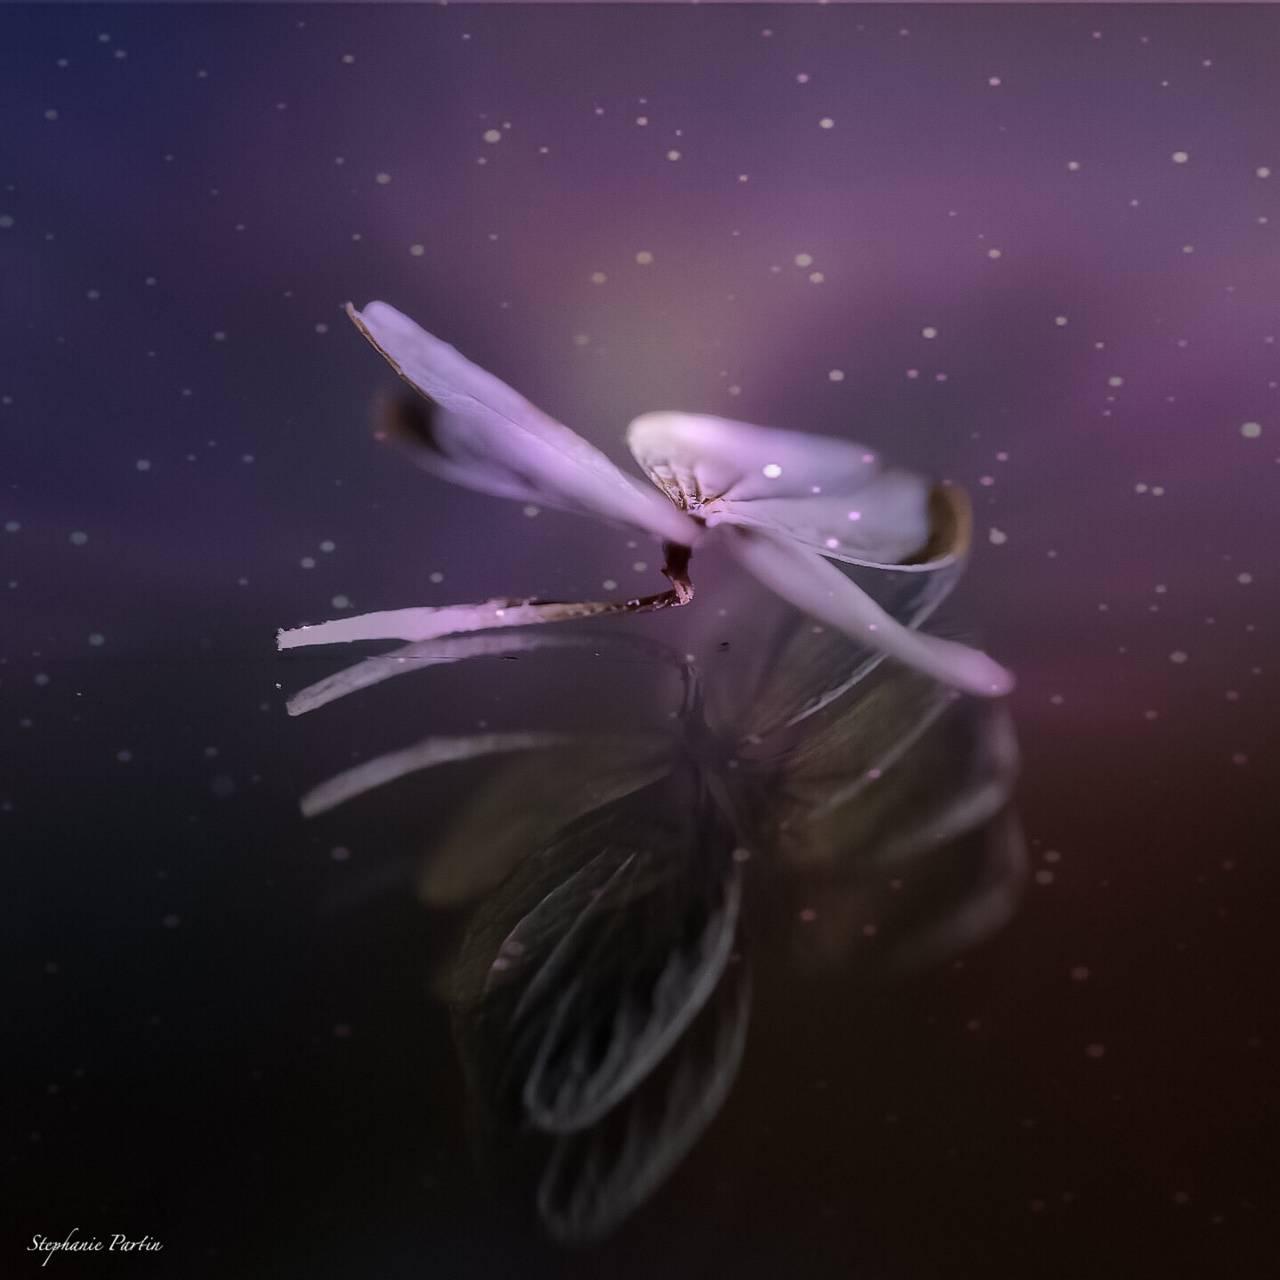 Starlight hydrangea